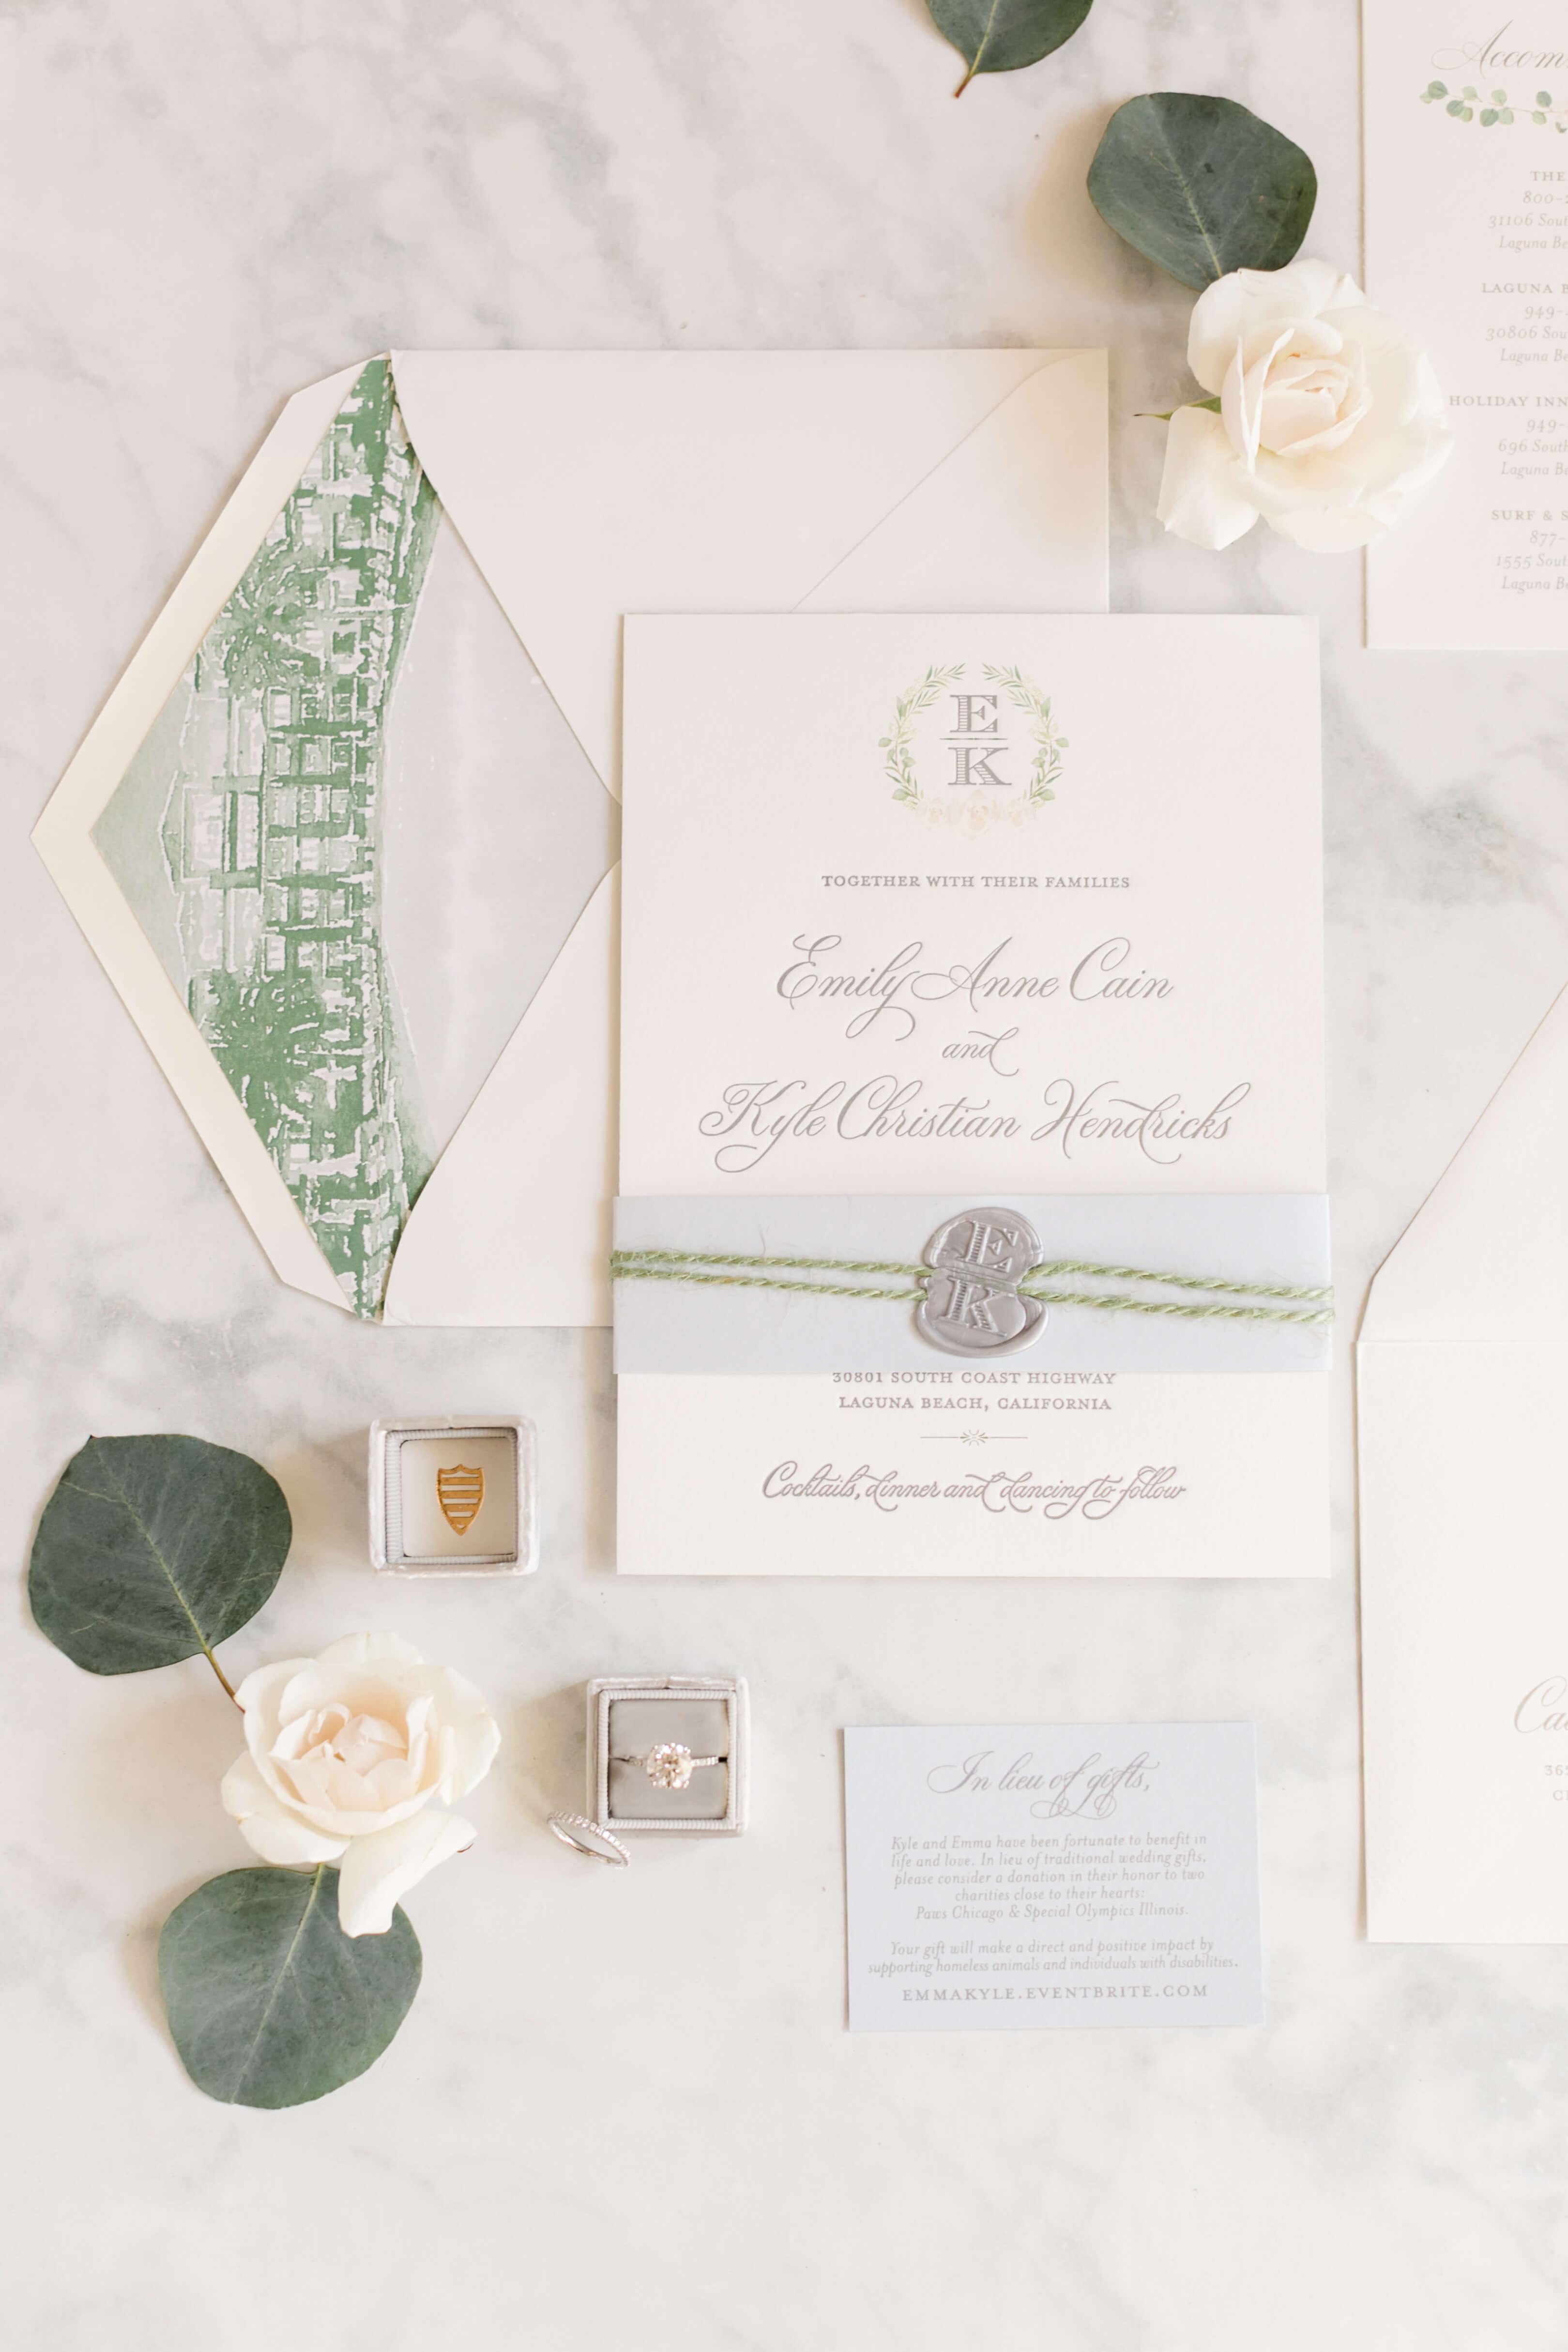 wedding invitations with monogram wax seal